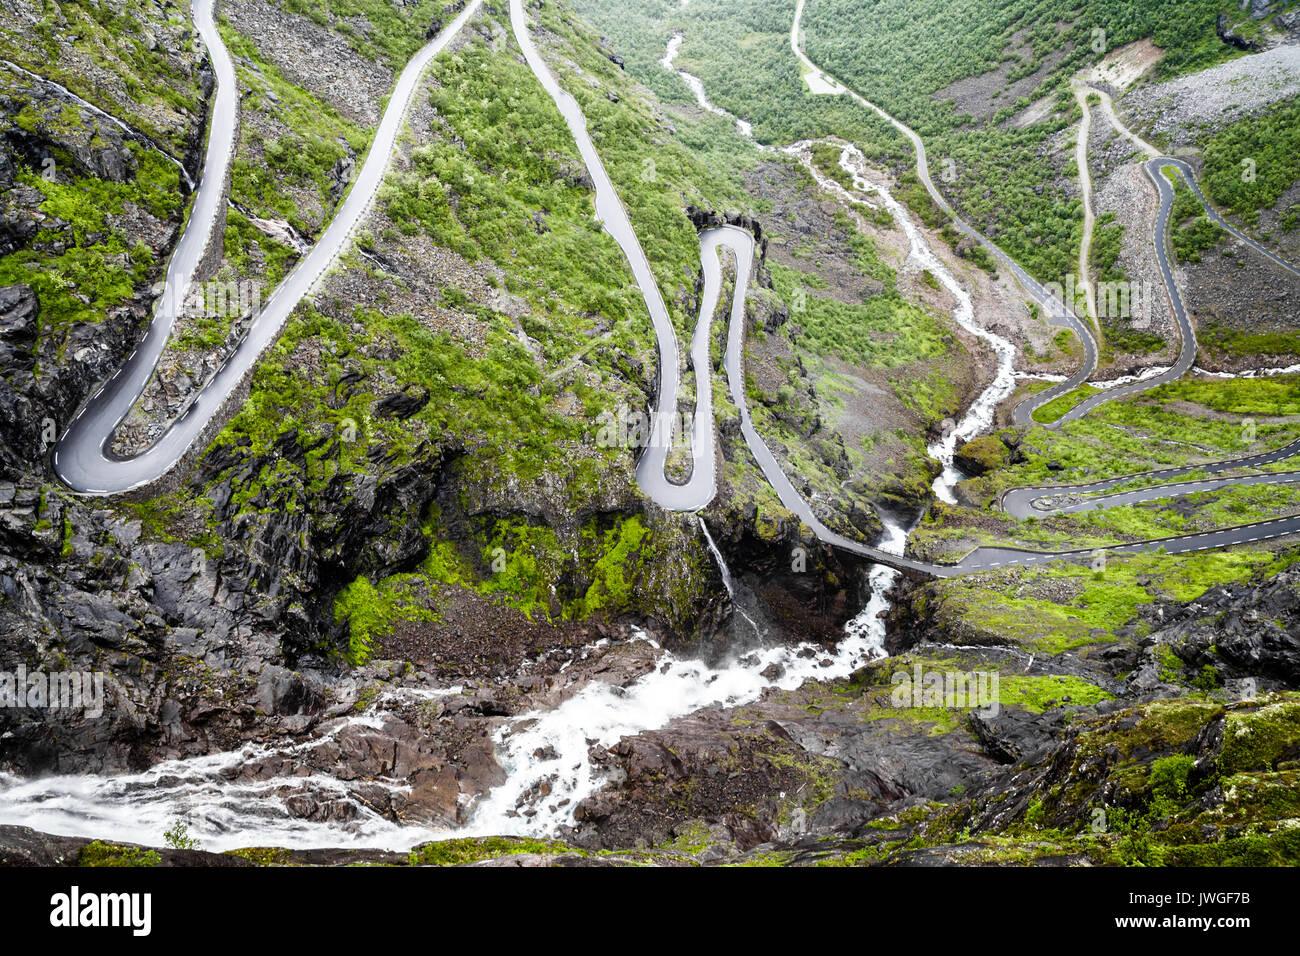 Hairpin bends at Trollstigen, Norway - Stock Image